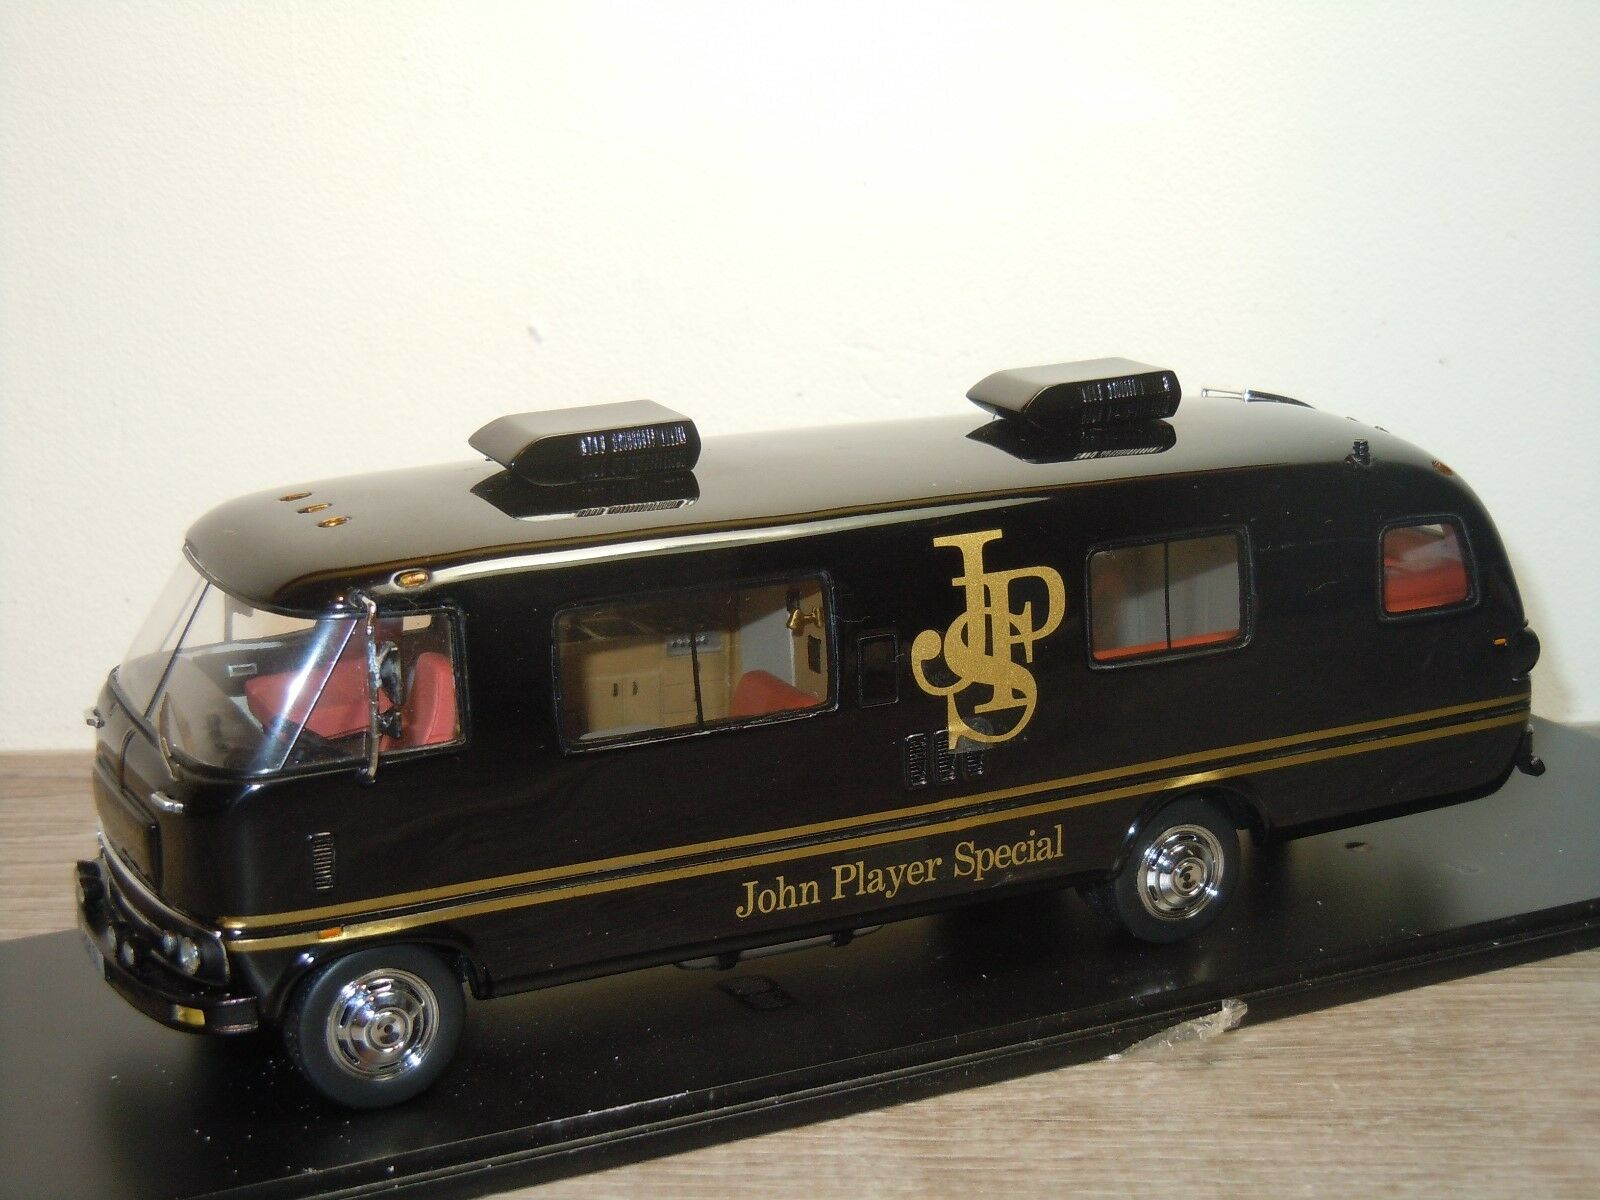 Dodge Travco John spelaer Team Lotus 1973 - Spark S0280 - 1 43 i låda 36474